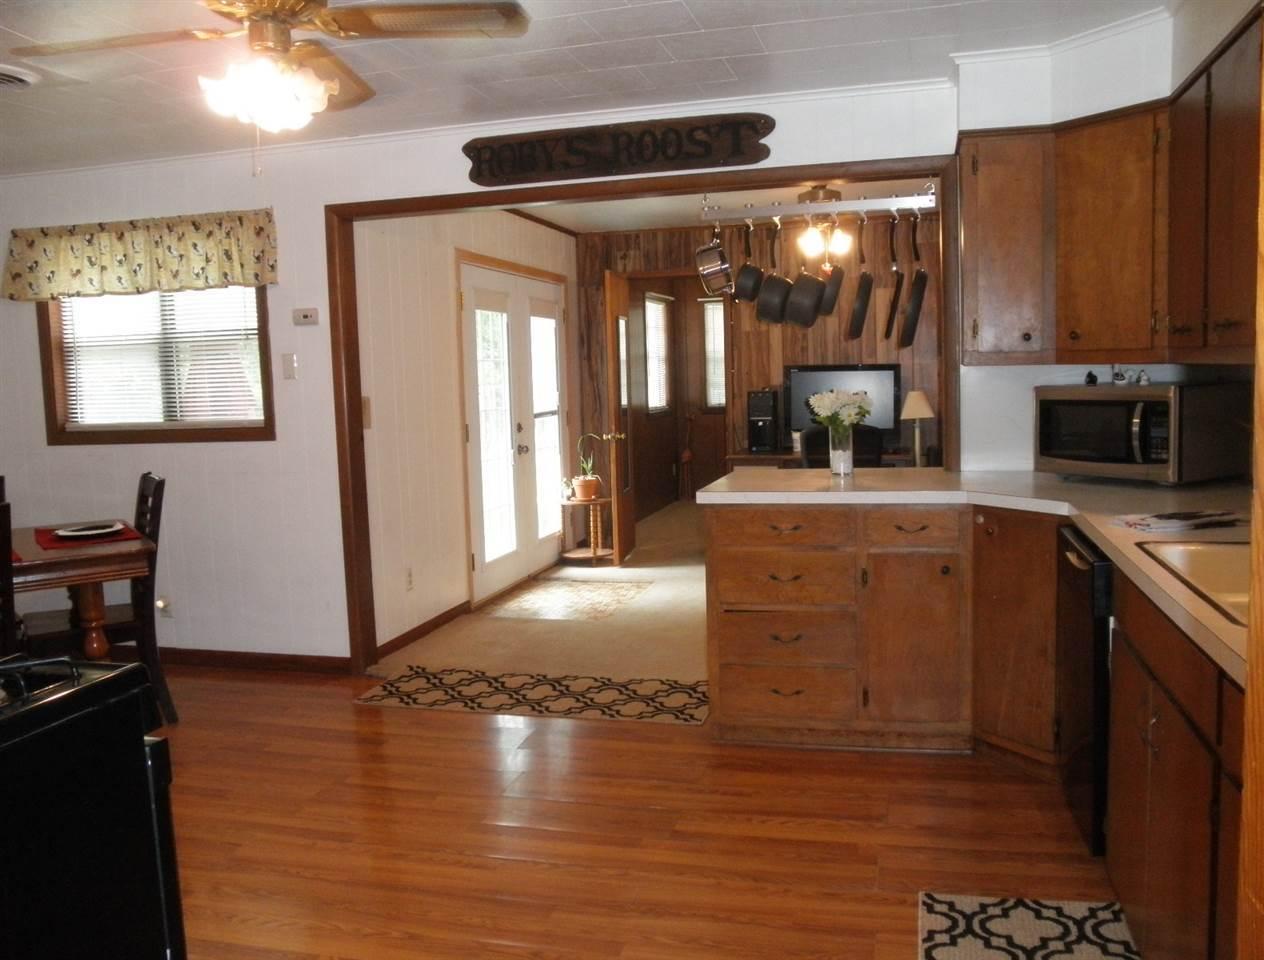 Sold Cross Sale W/ MLS | 808 Gray  Ponca City, OK 74604 5